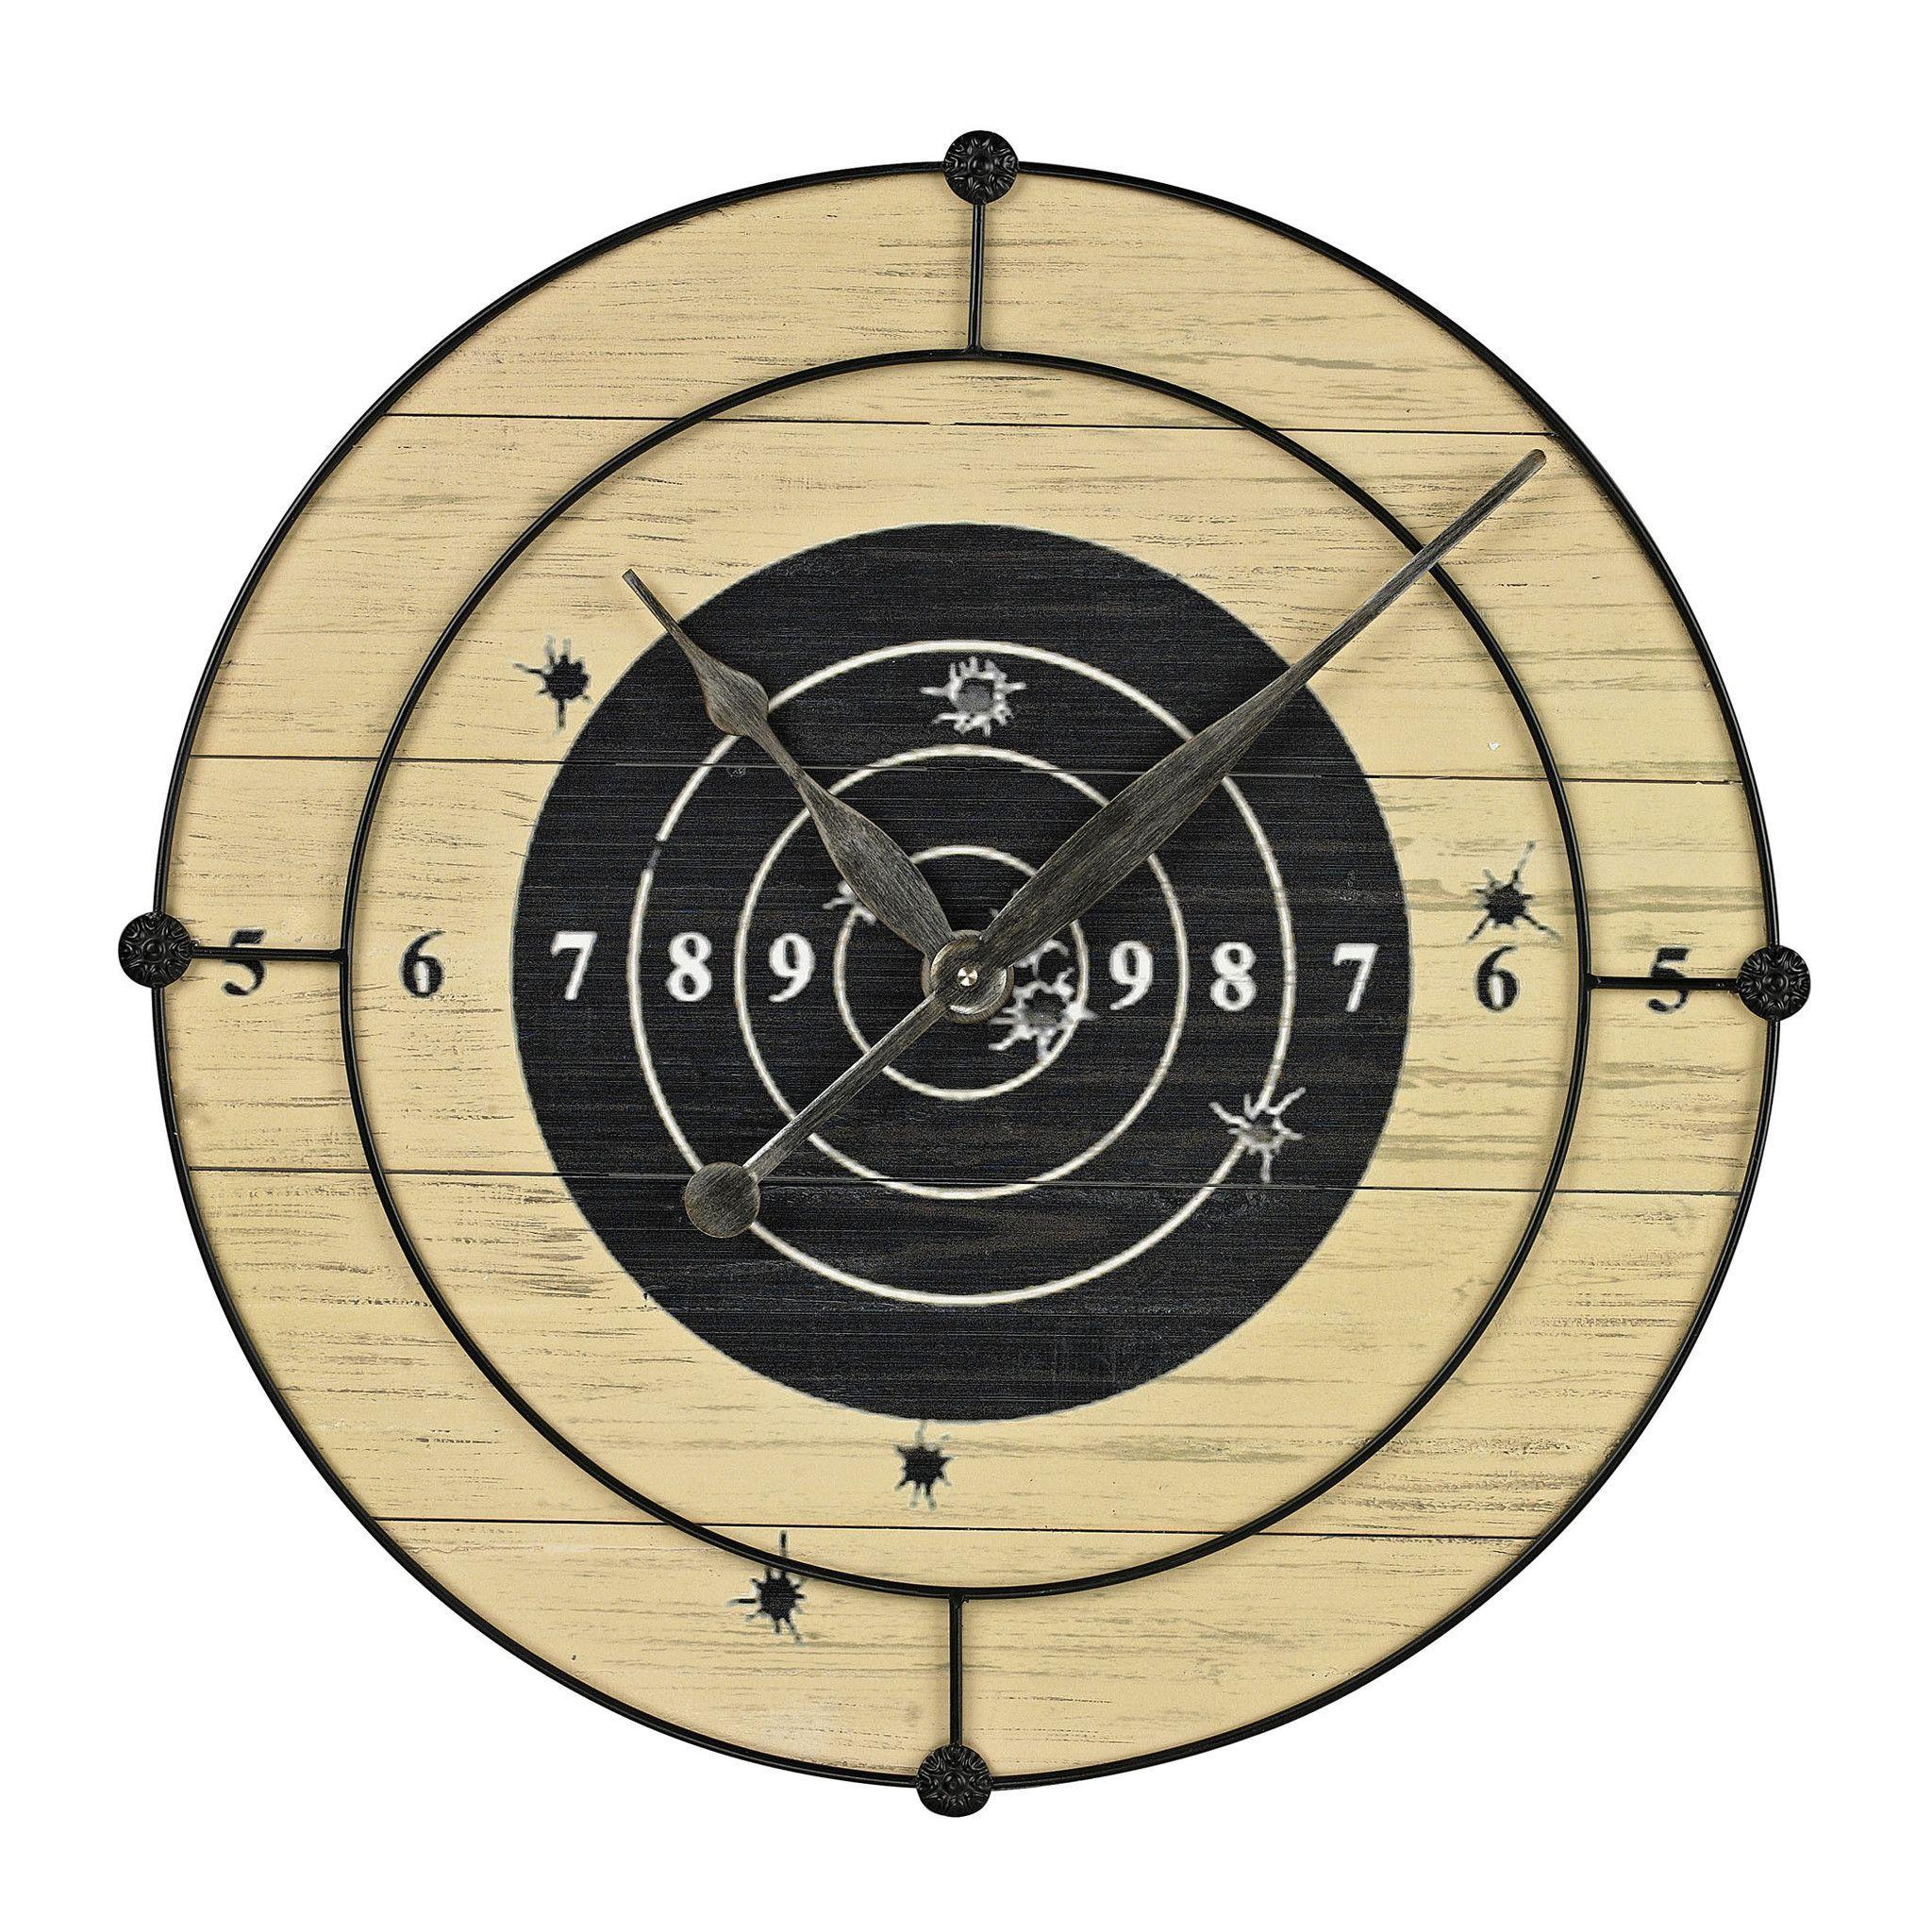 Target Practice Wall Clock | Target practice, Wall clocks and Target